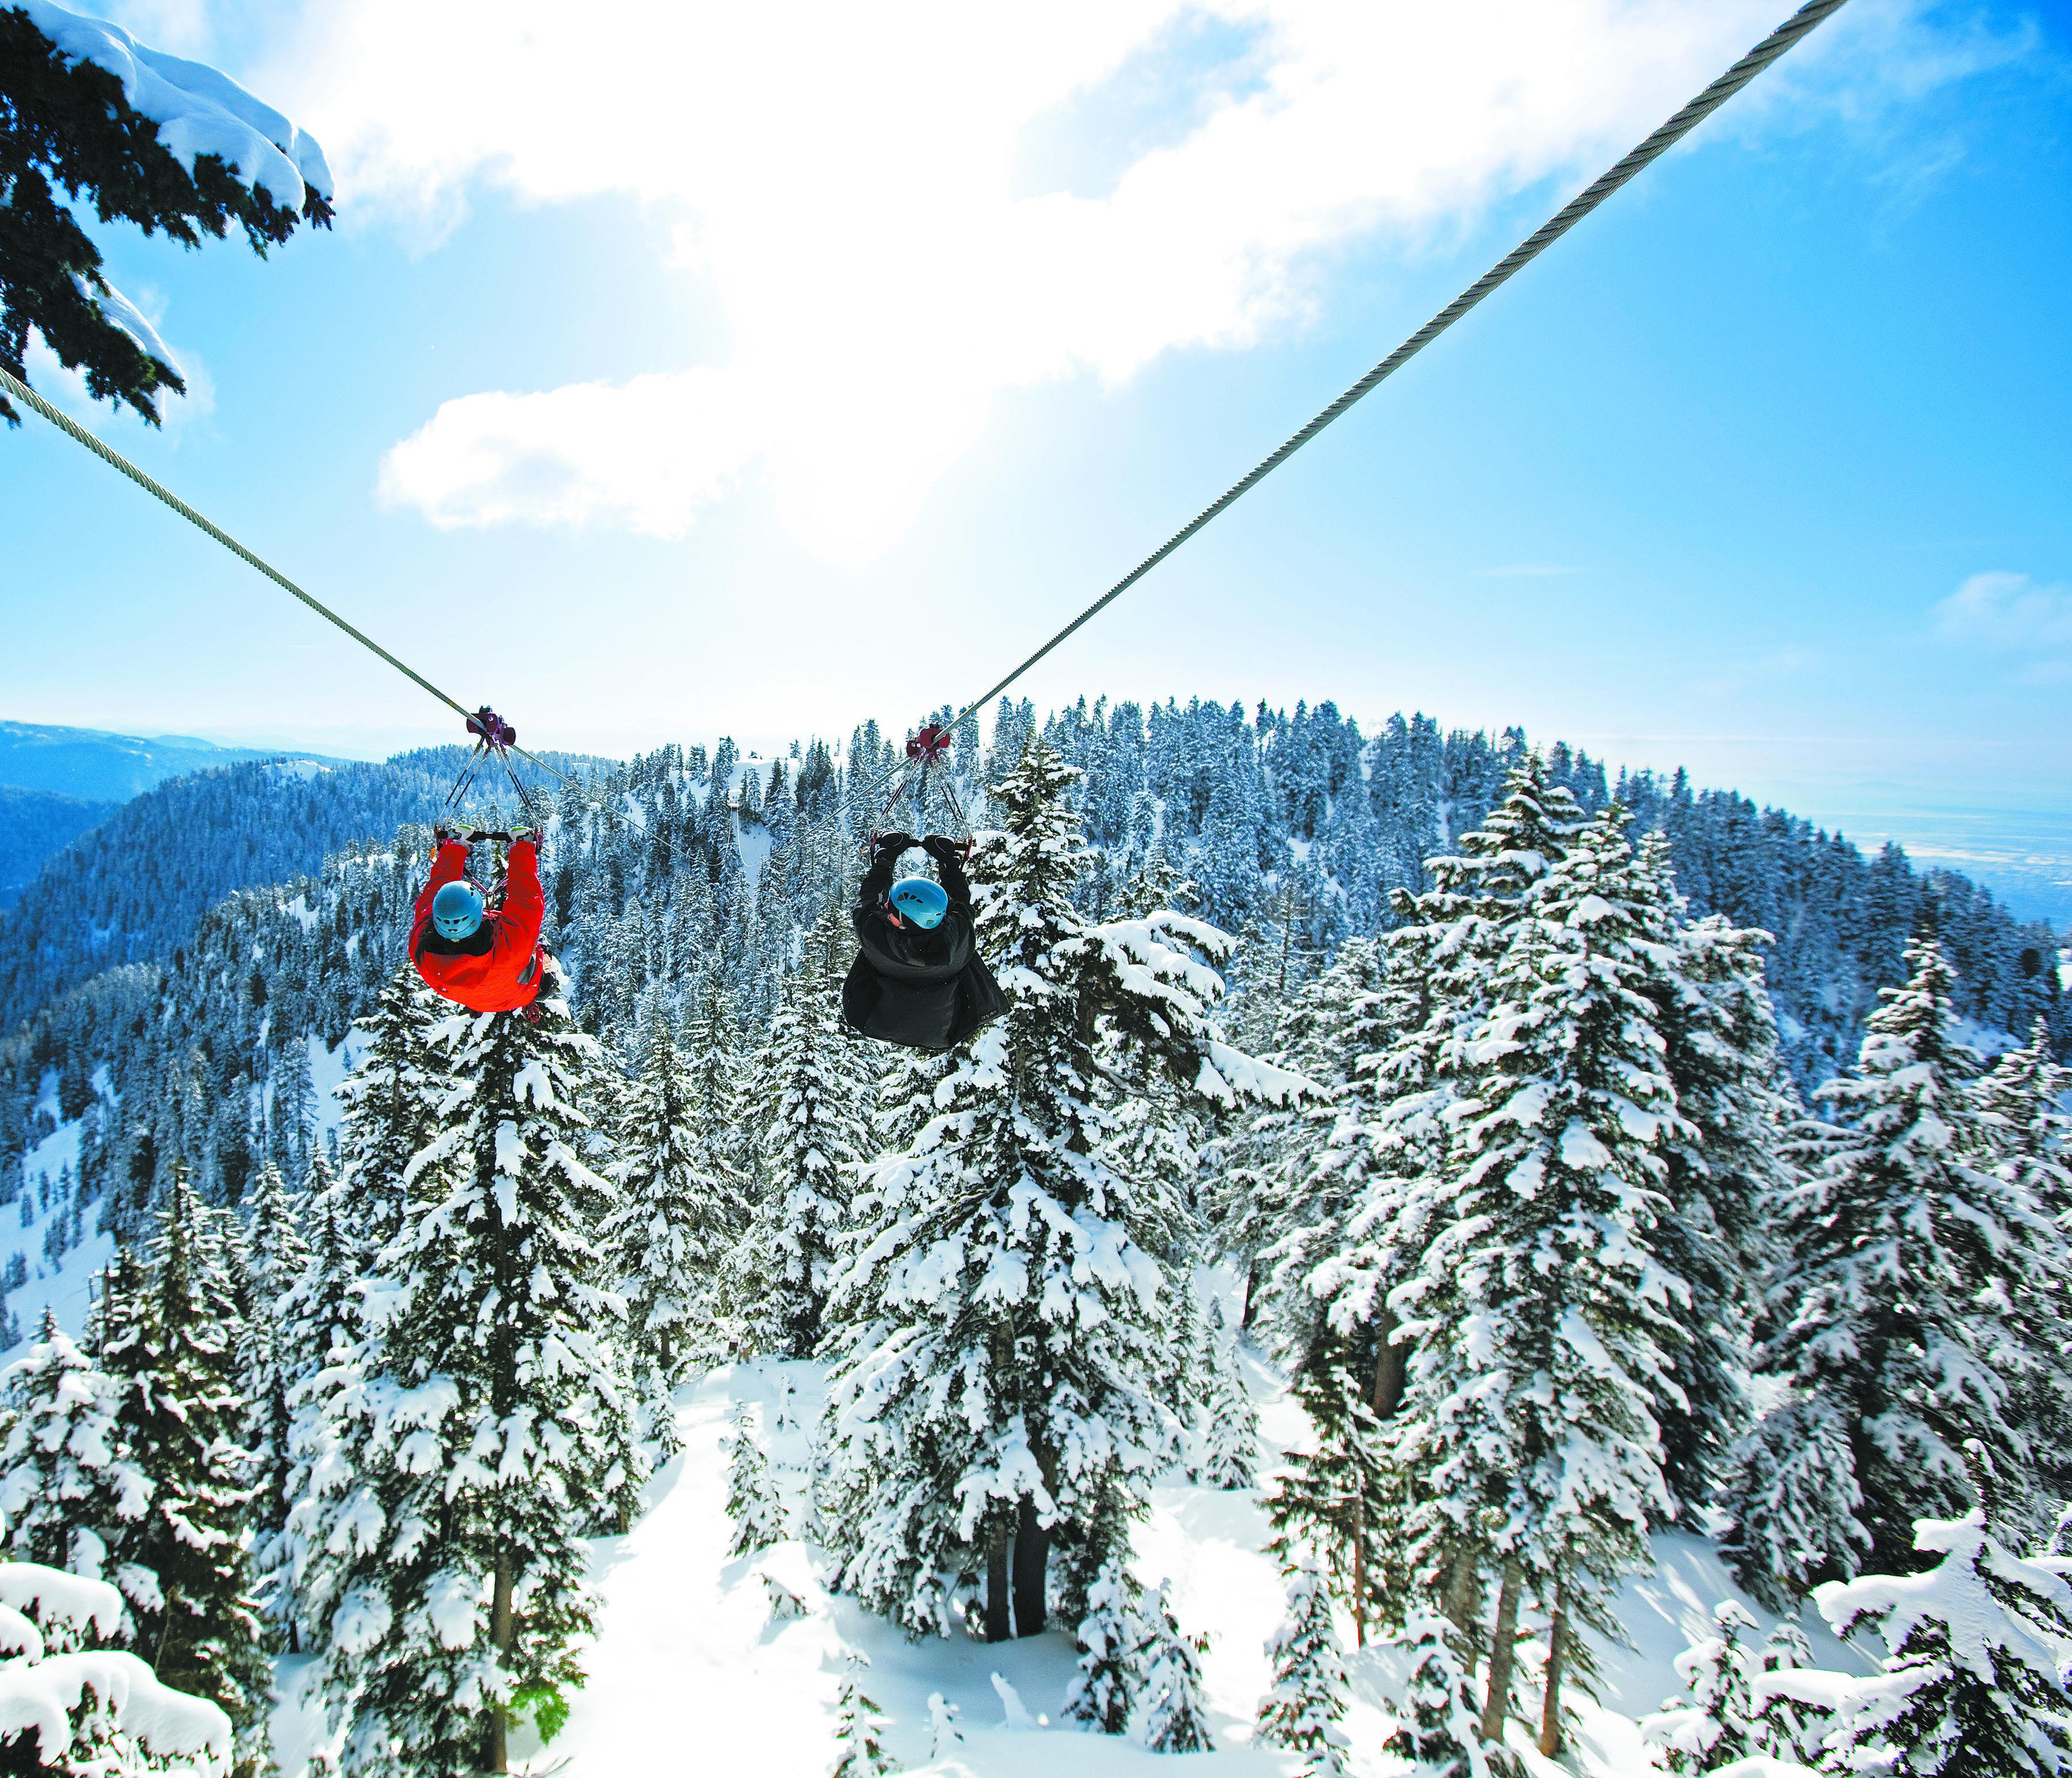 Ziplining In The Snow